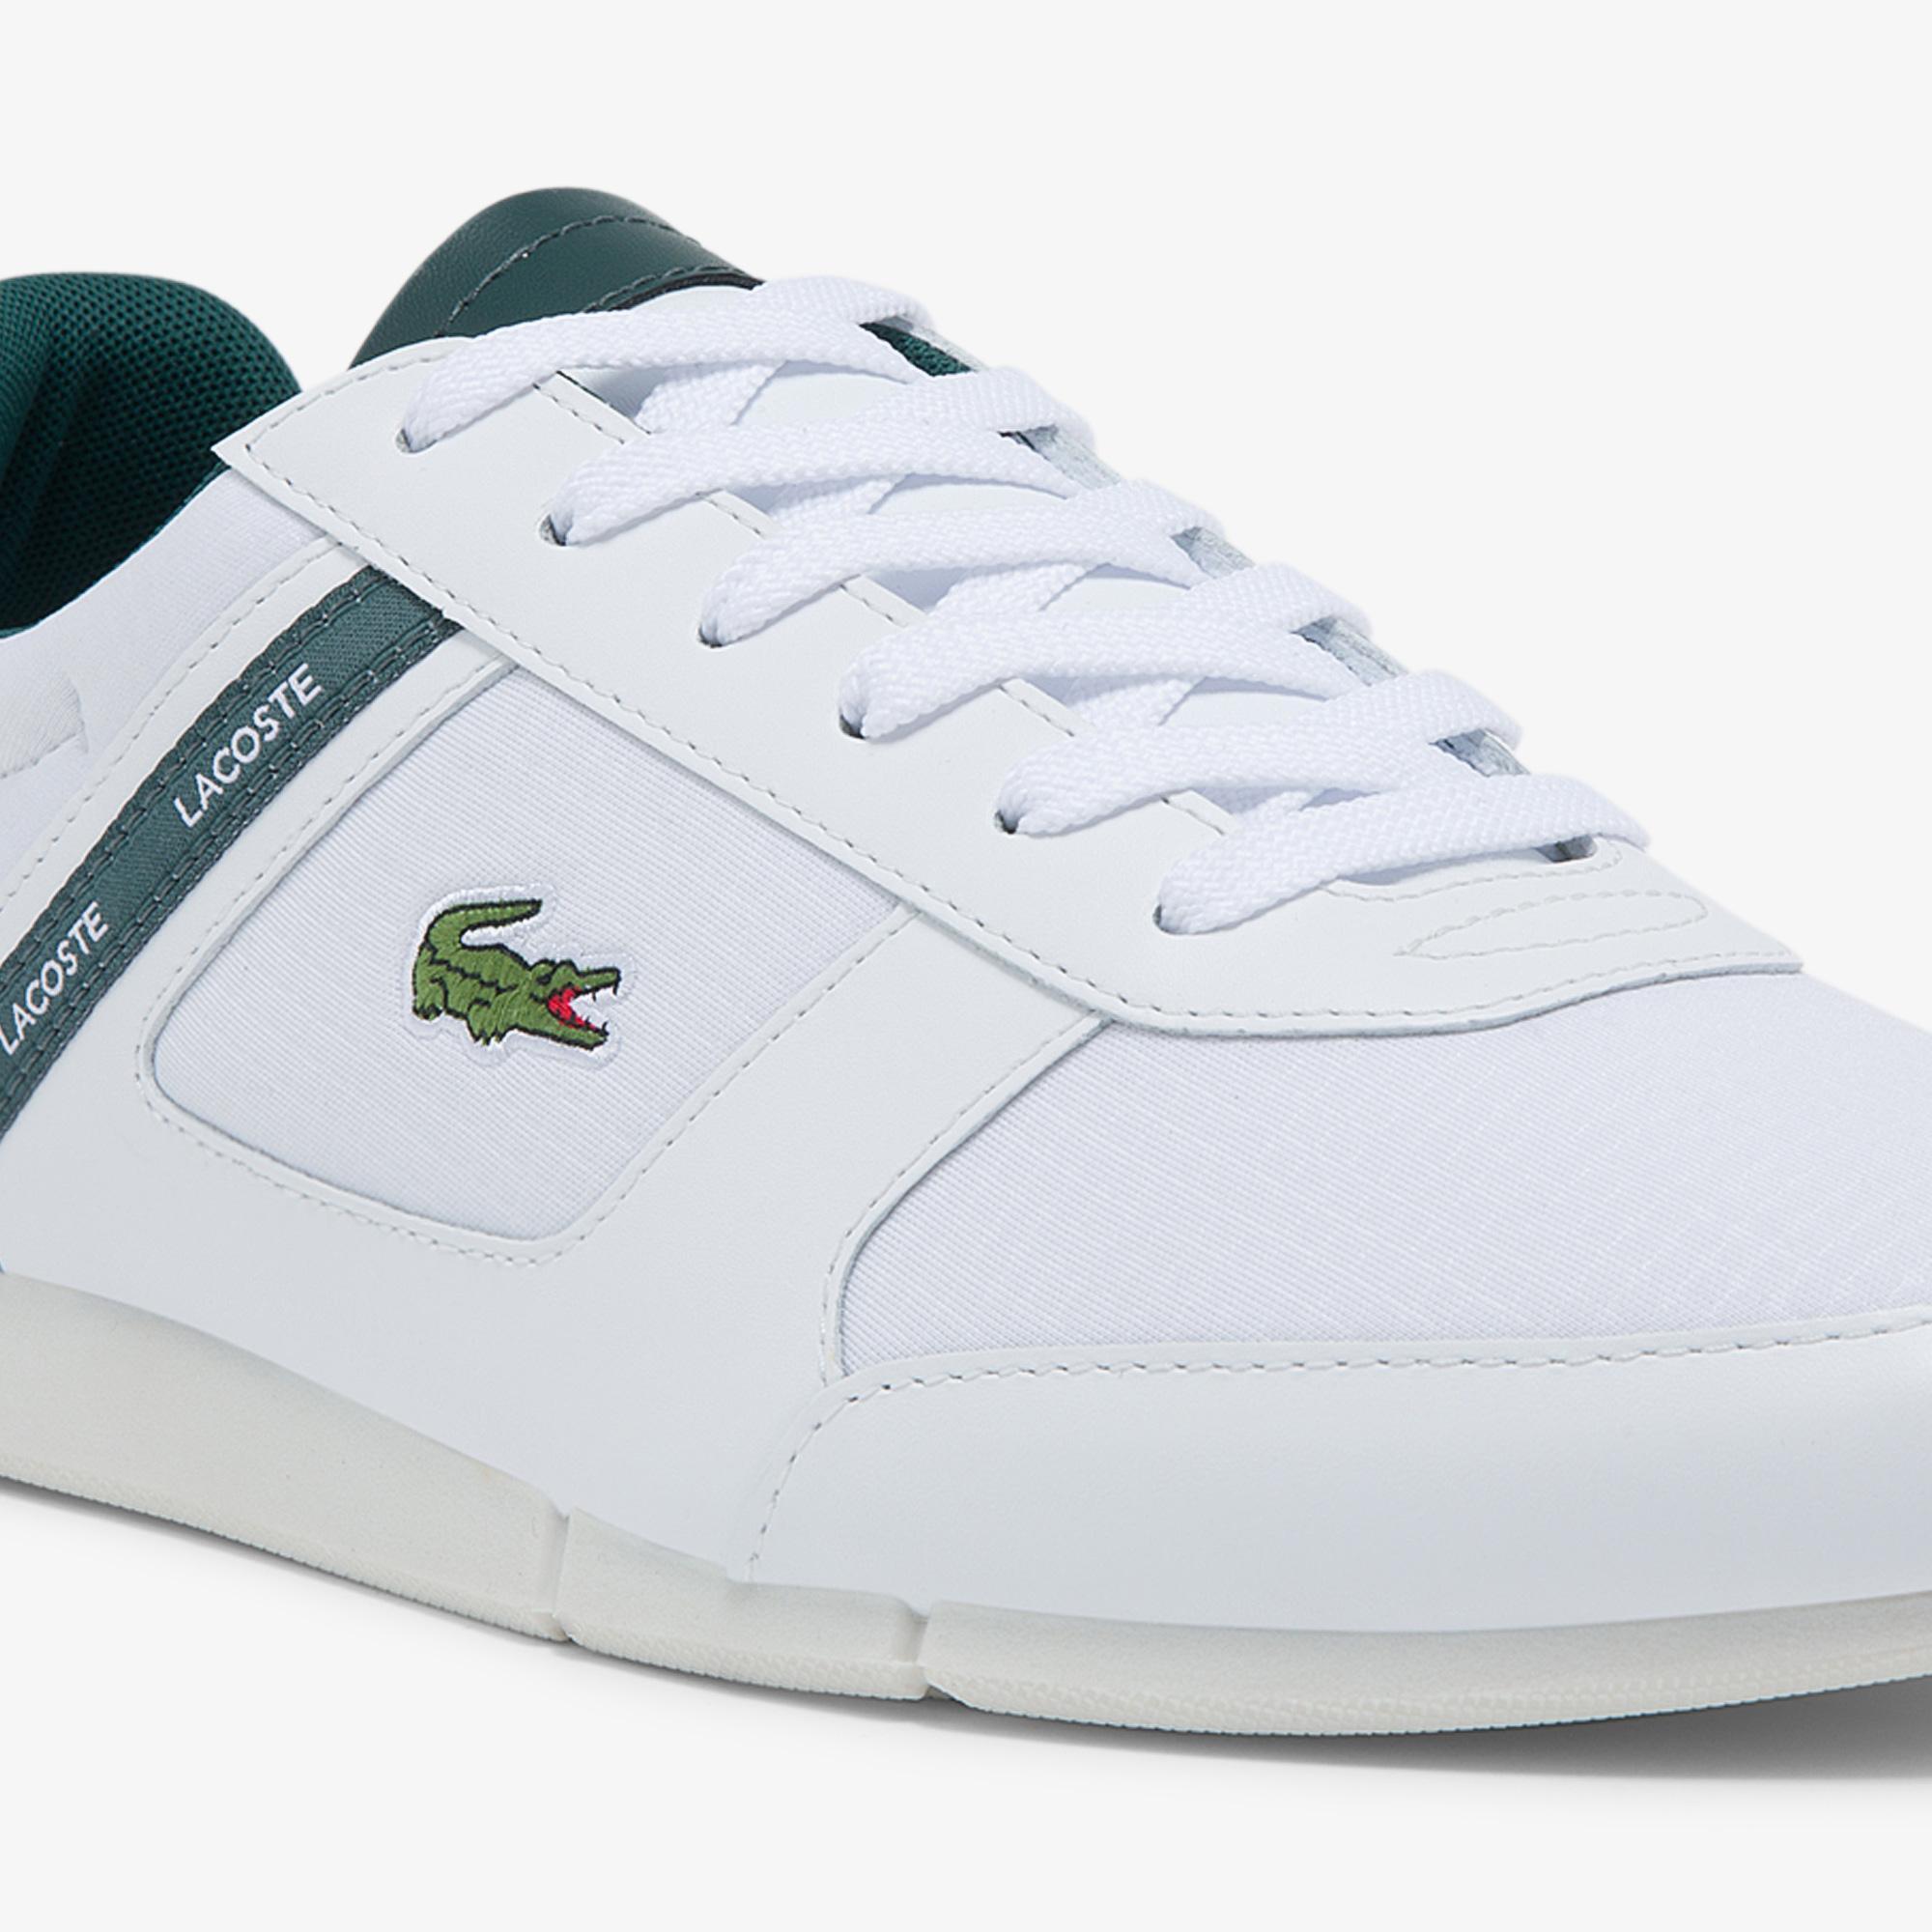 Lacoste Menerva Sport 0121 1 Cma Erkek Beyaz - Yeşil Sneaker